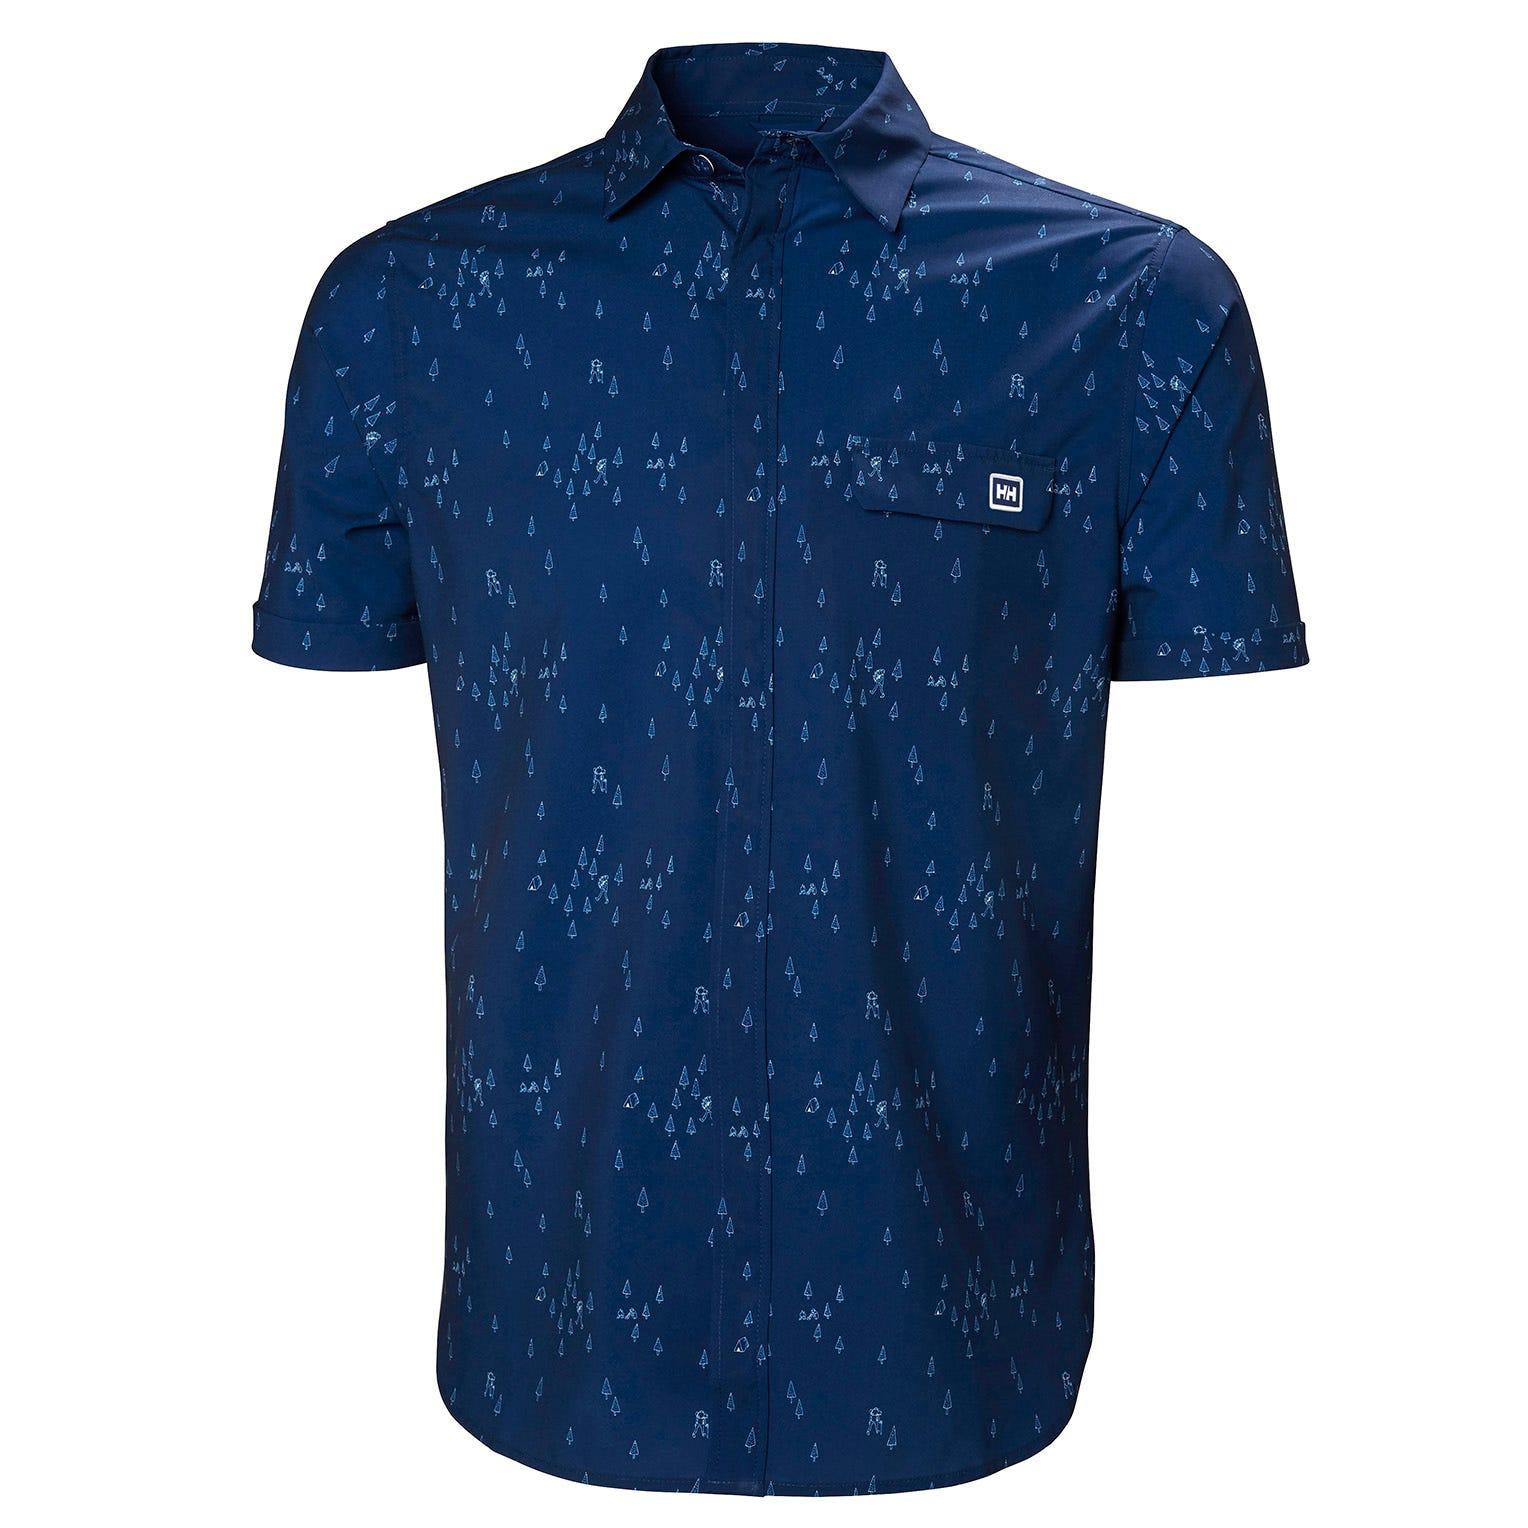 Helly Hansen Oya Shirt Mens Midlayer Blue XL